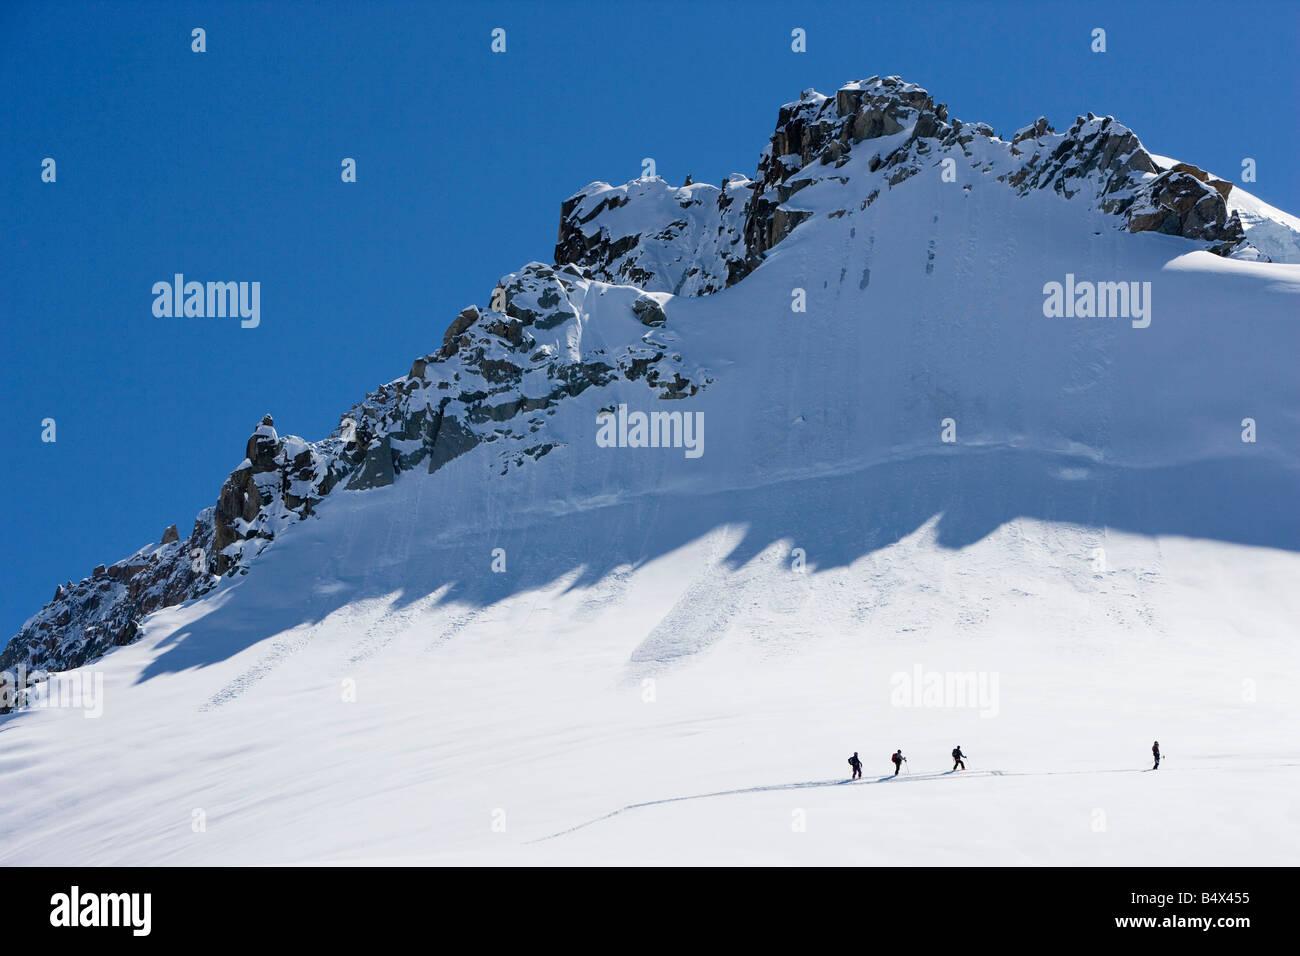 Silhouetted ski tourers on the mountain - Stock Image